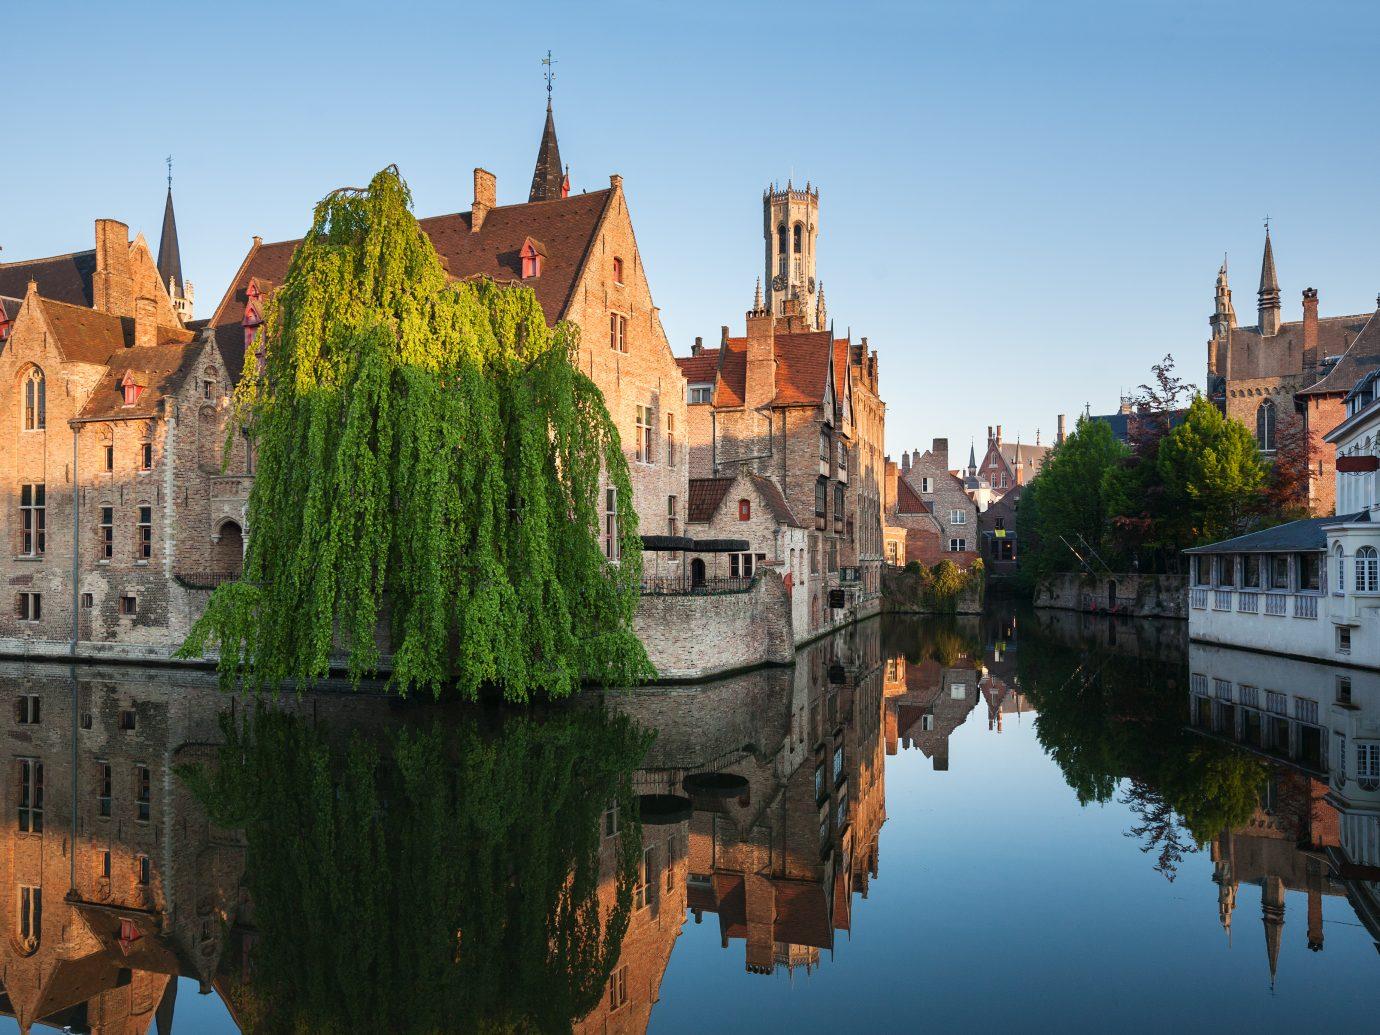 Rozenhoedkaai in Brugge, Dijver river canal twilight and Belfort tower.